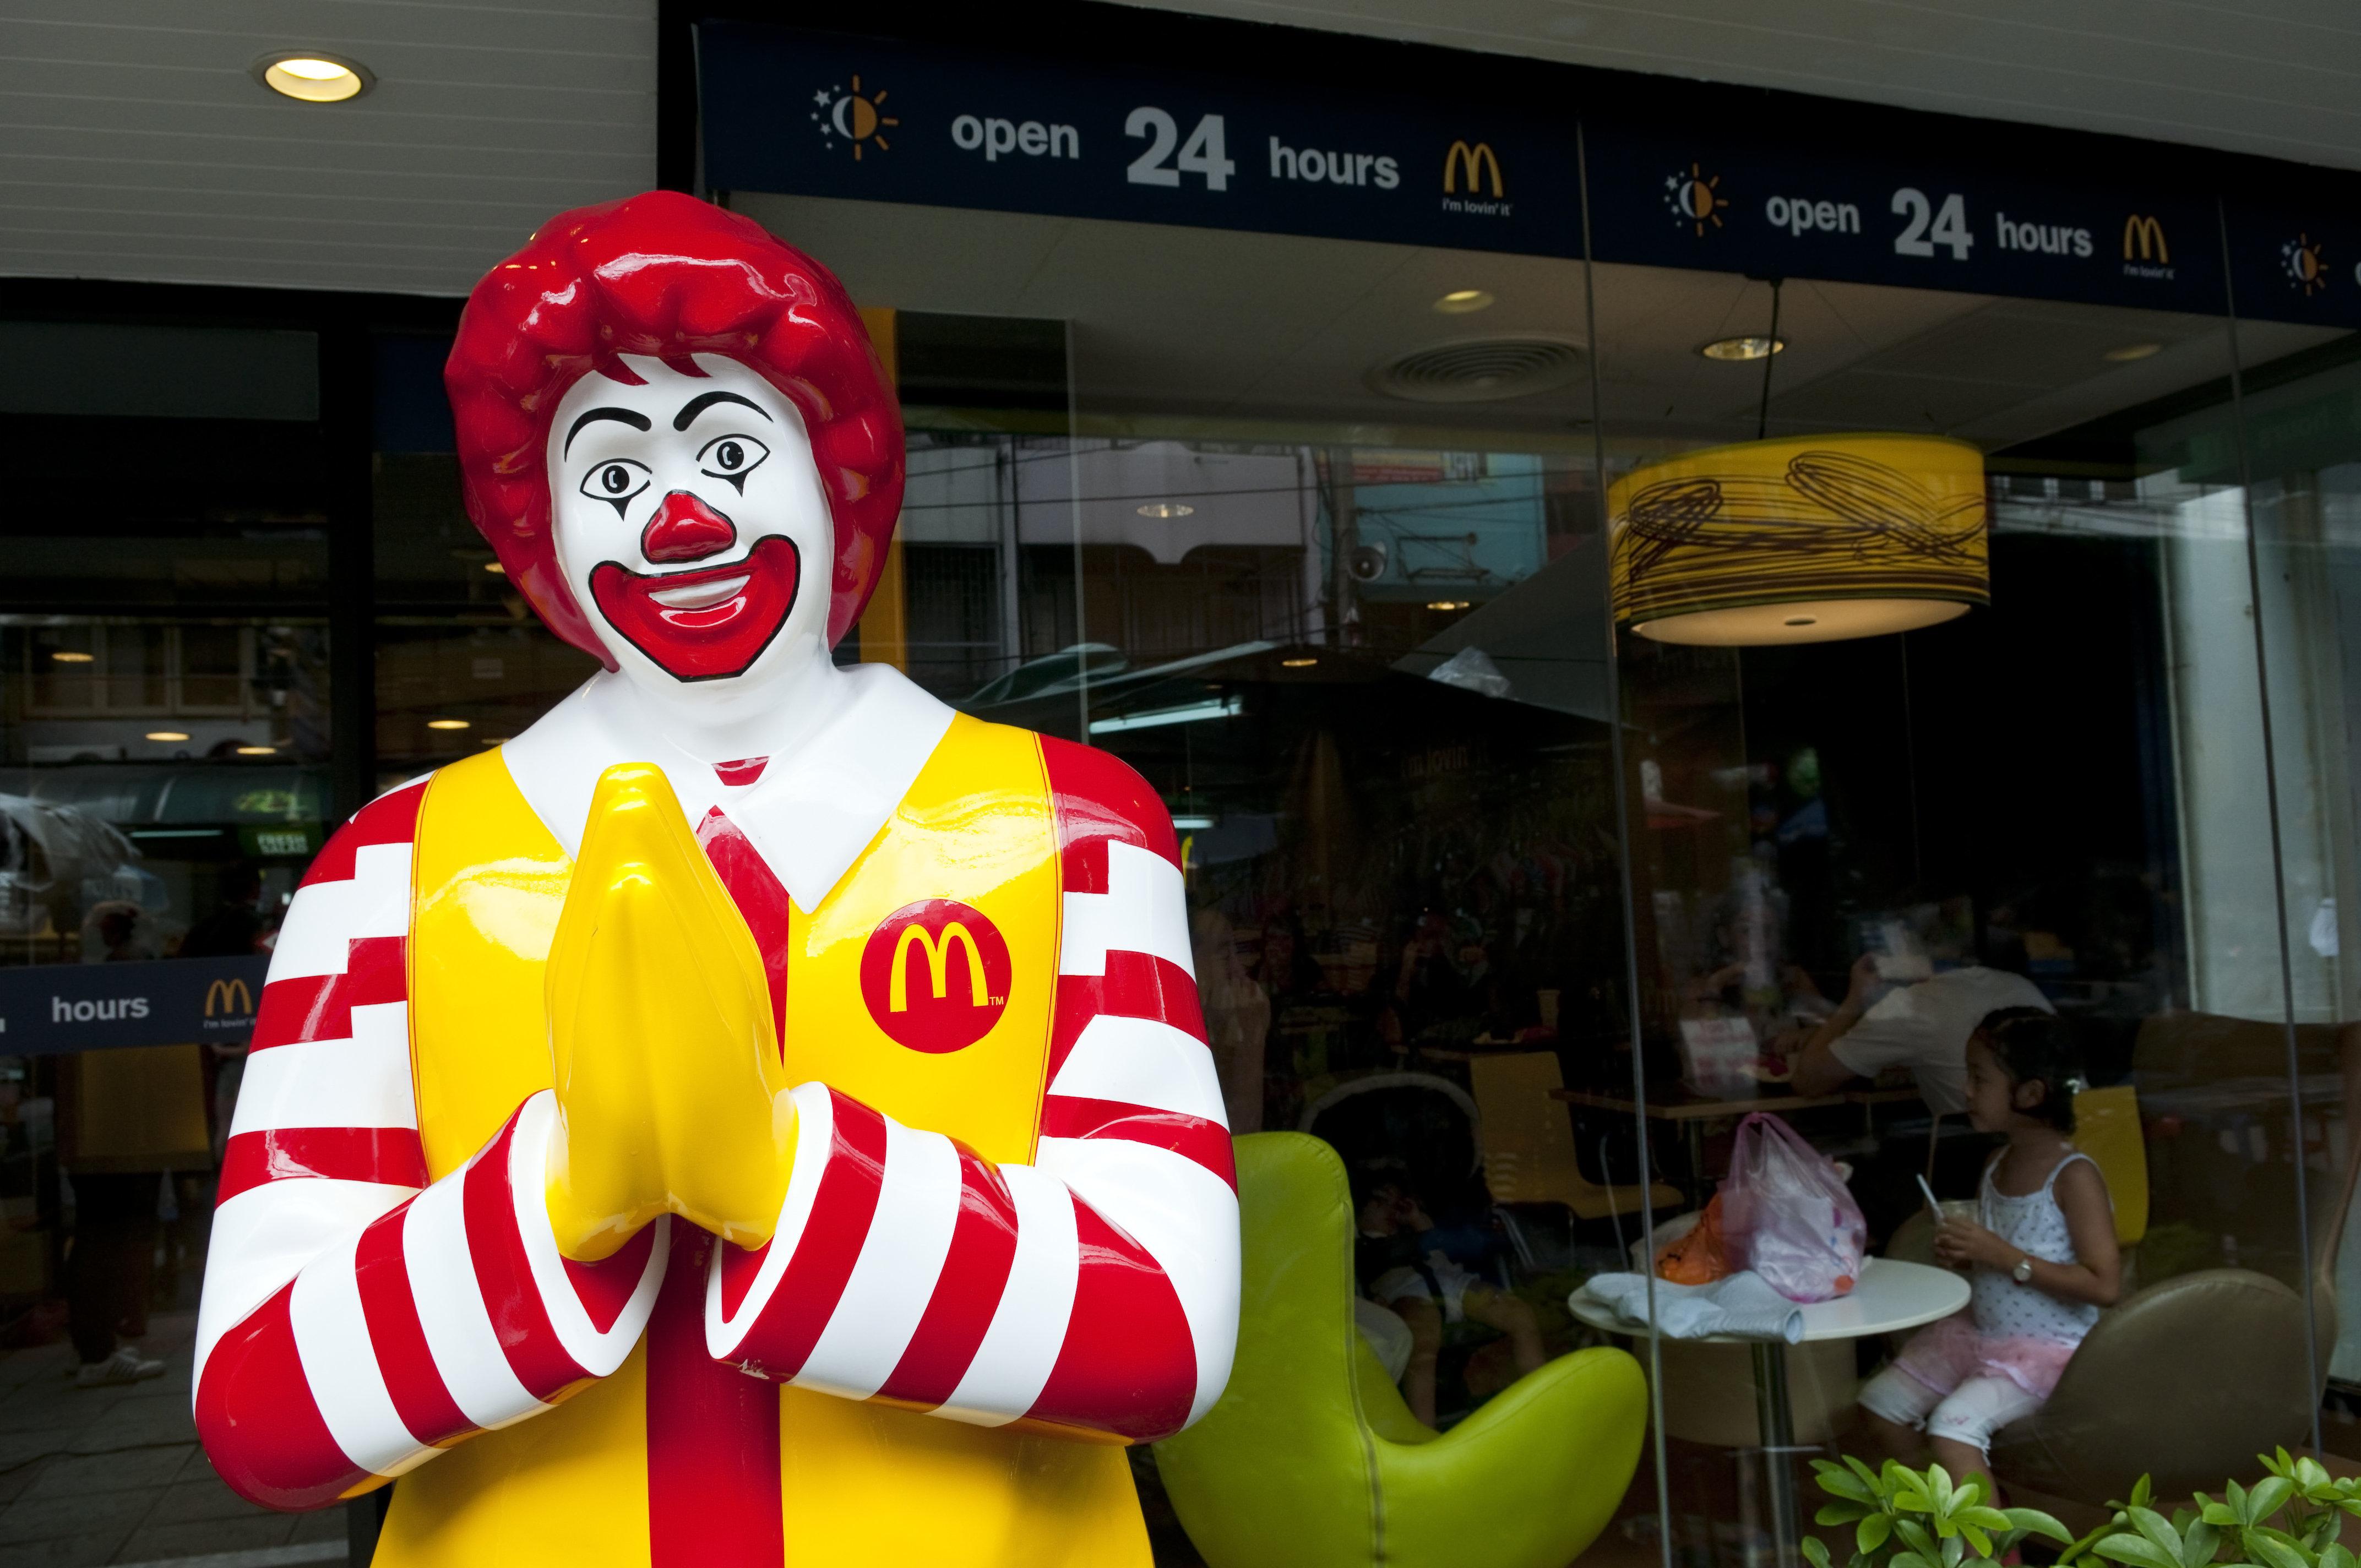 Bangkok, Thailand - September 24, 2011: Ronald McDonald performs a Thai wai greeting outside a 24-hour McDonalds restaurant on Khao San Road.